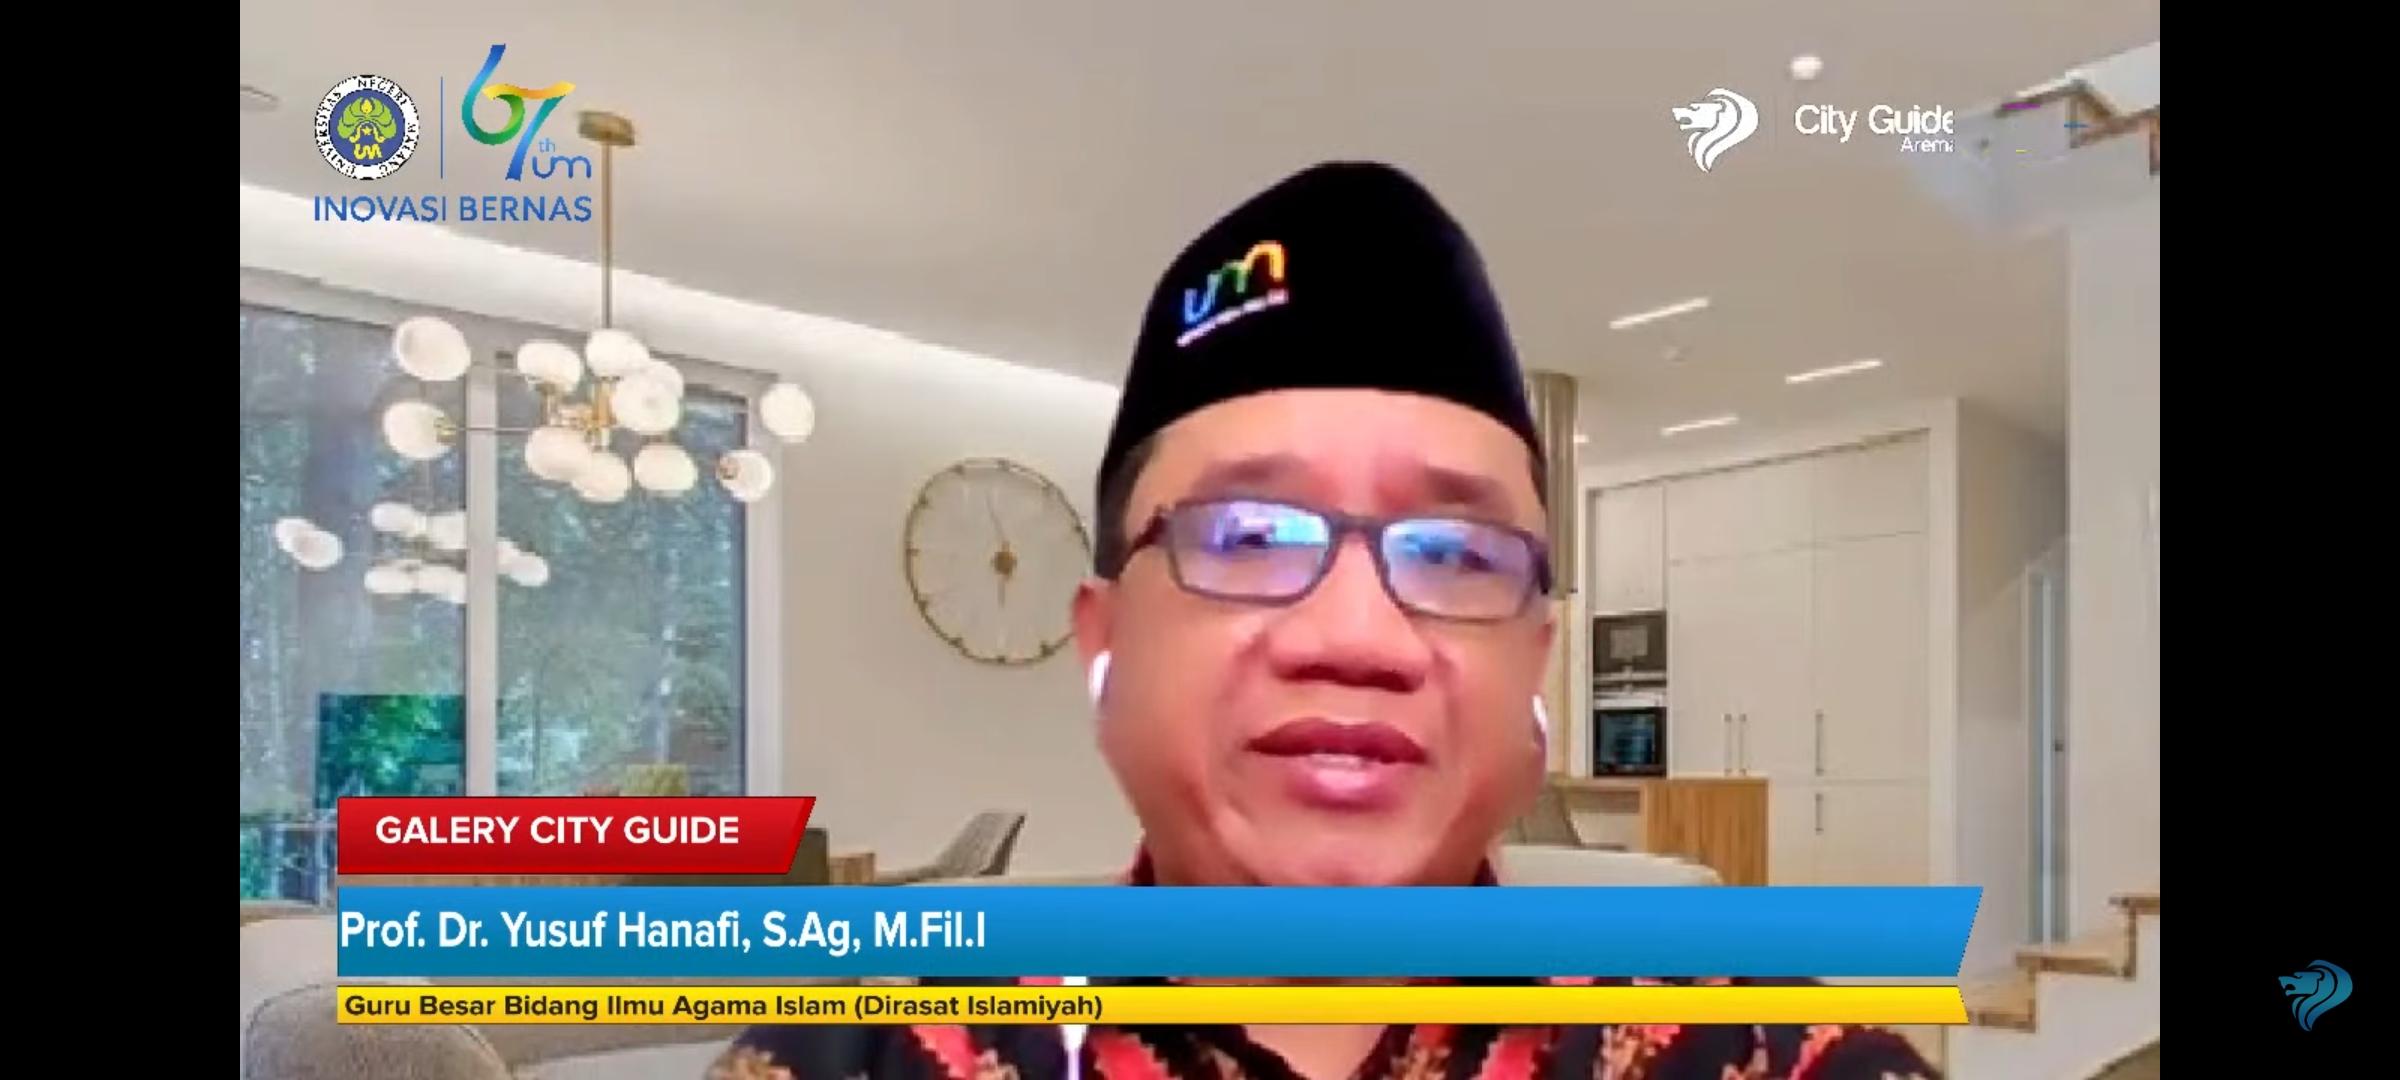 Photo of Talkshow Galery City Guide 911 FM Bersama Prof. Yusuf Hanafi: Moderasi Beragama Merajut Kebhinekaan